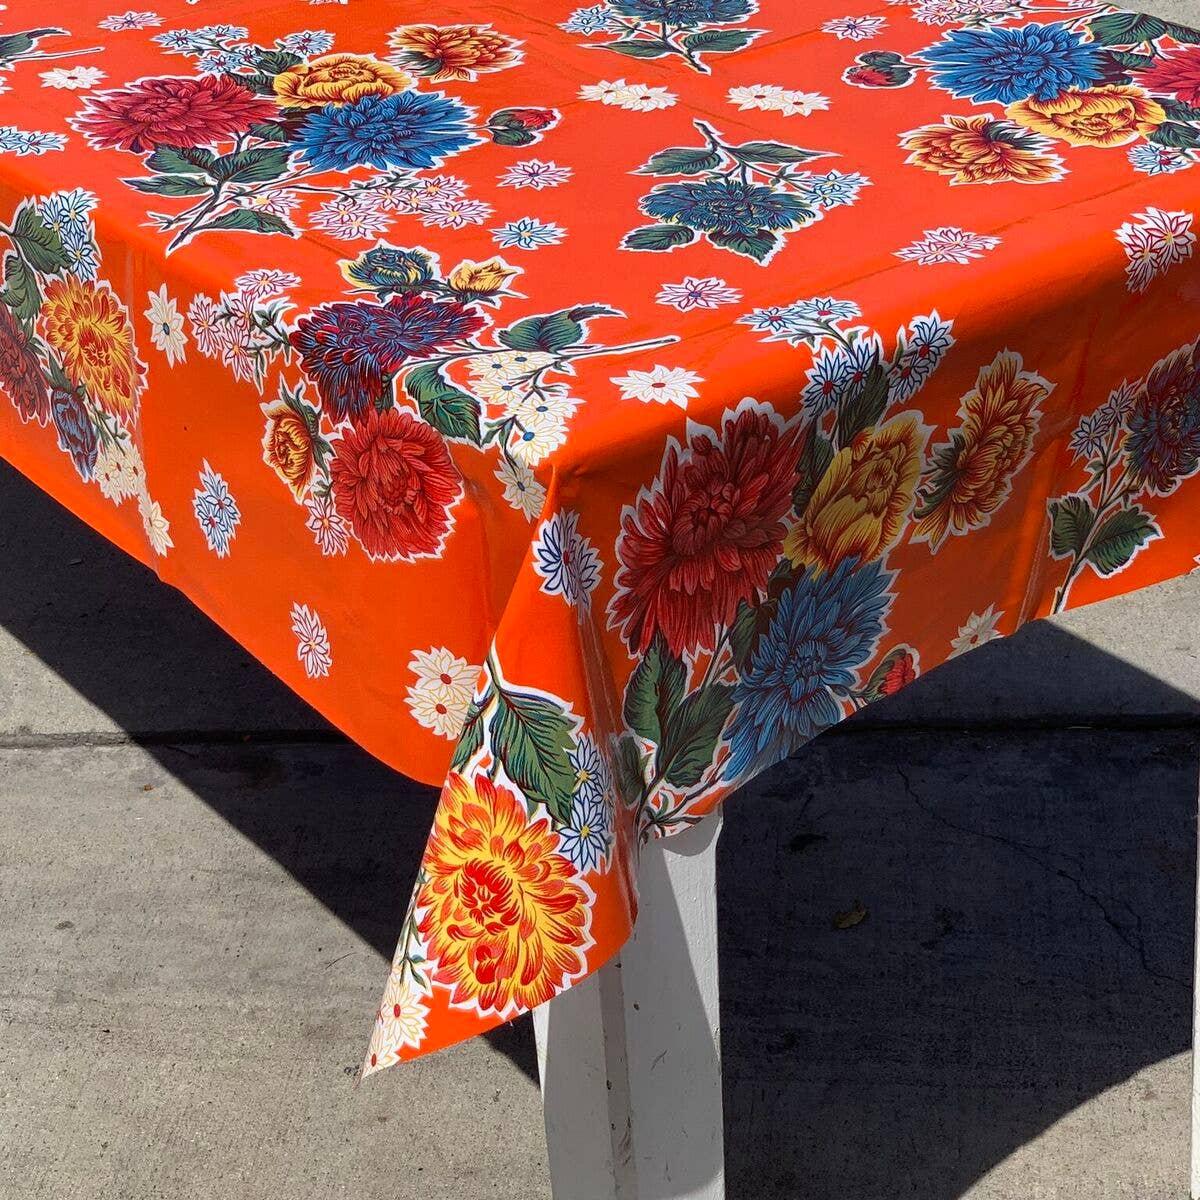 Fuji on Orange Oilcloth